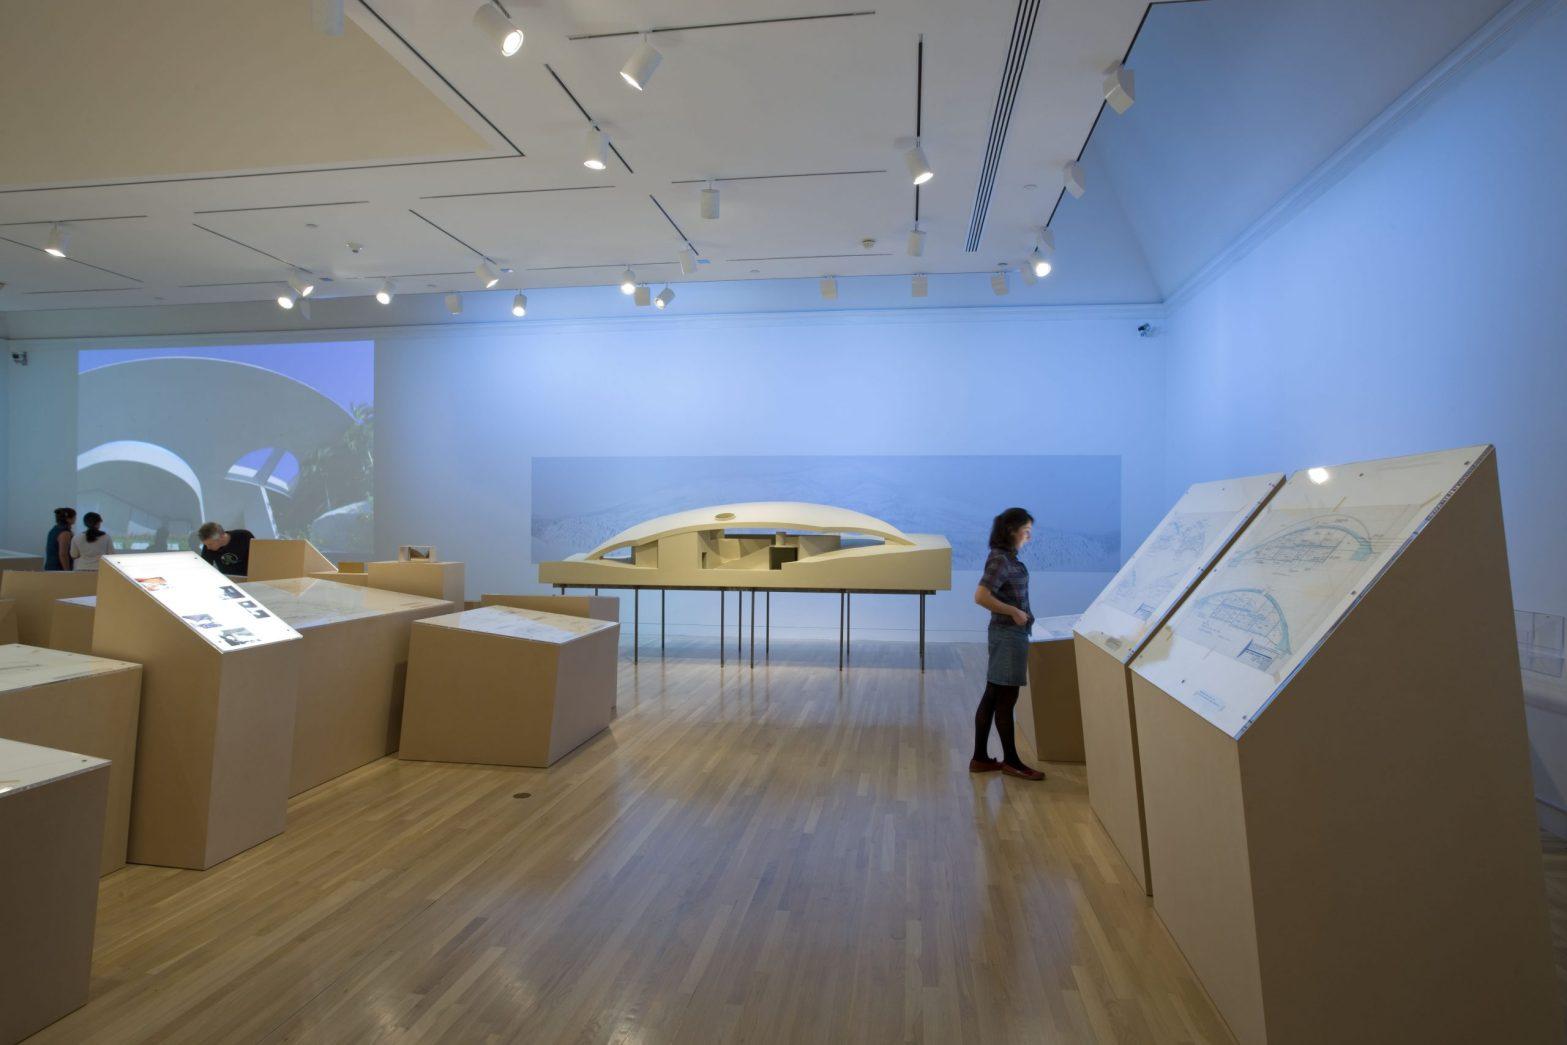 Thumbnail for The Architecture of John Lautner